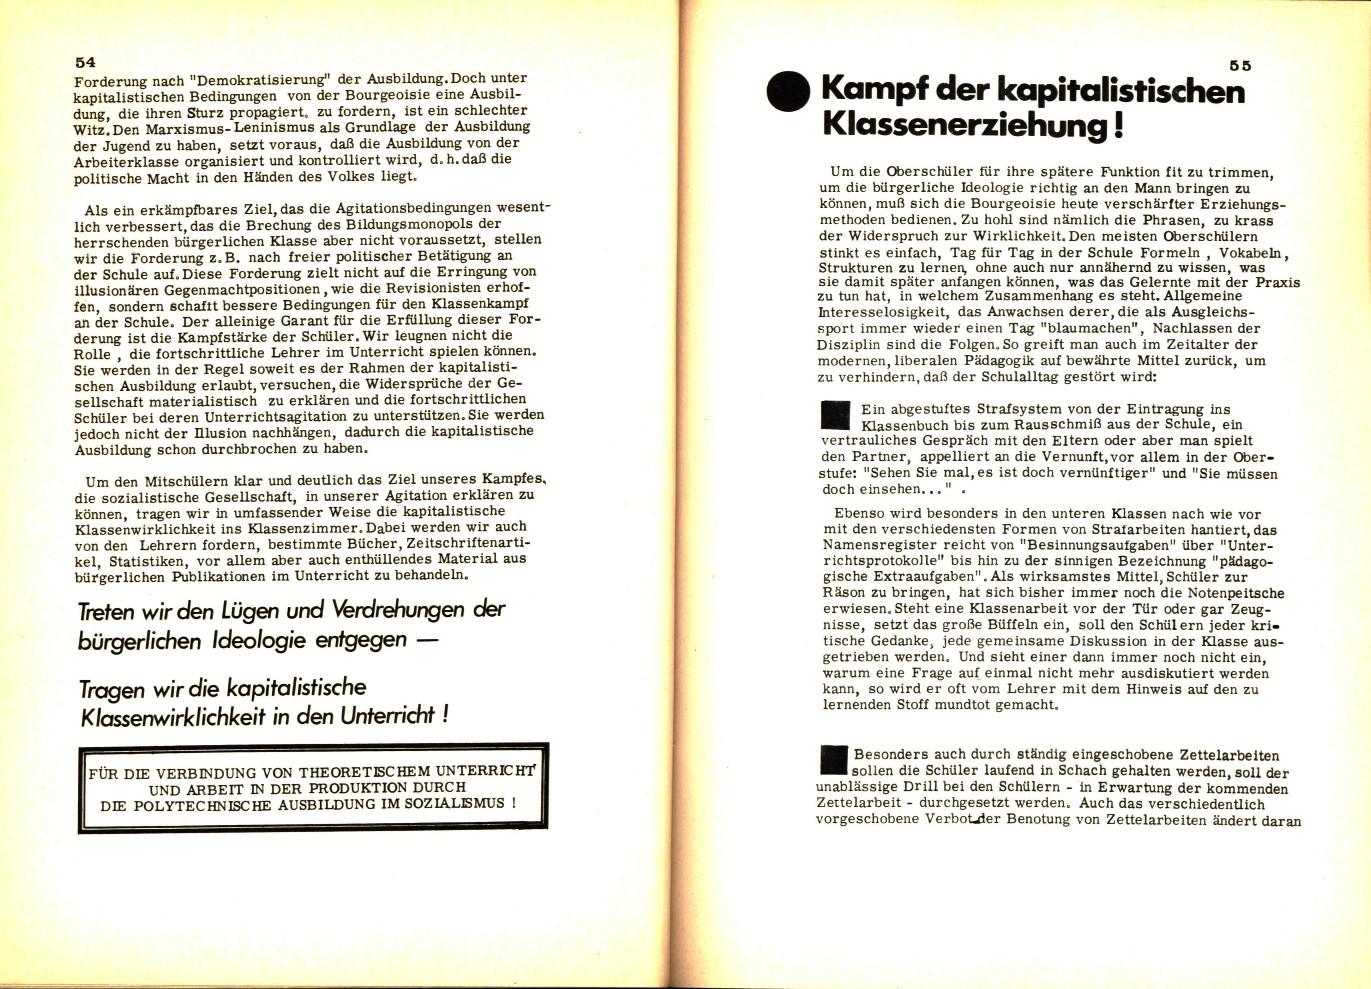 KOV_1973_Aktionsprogramm_30